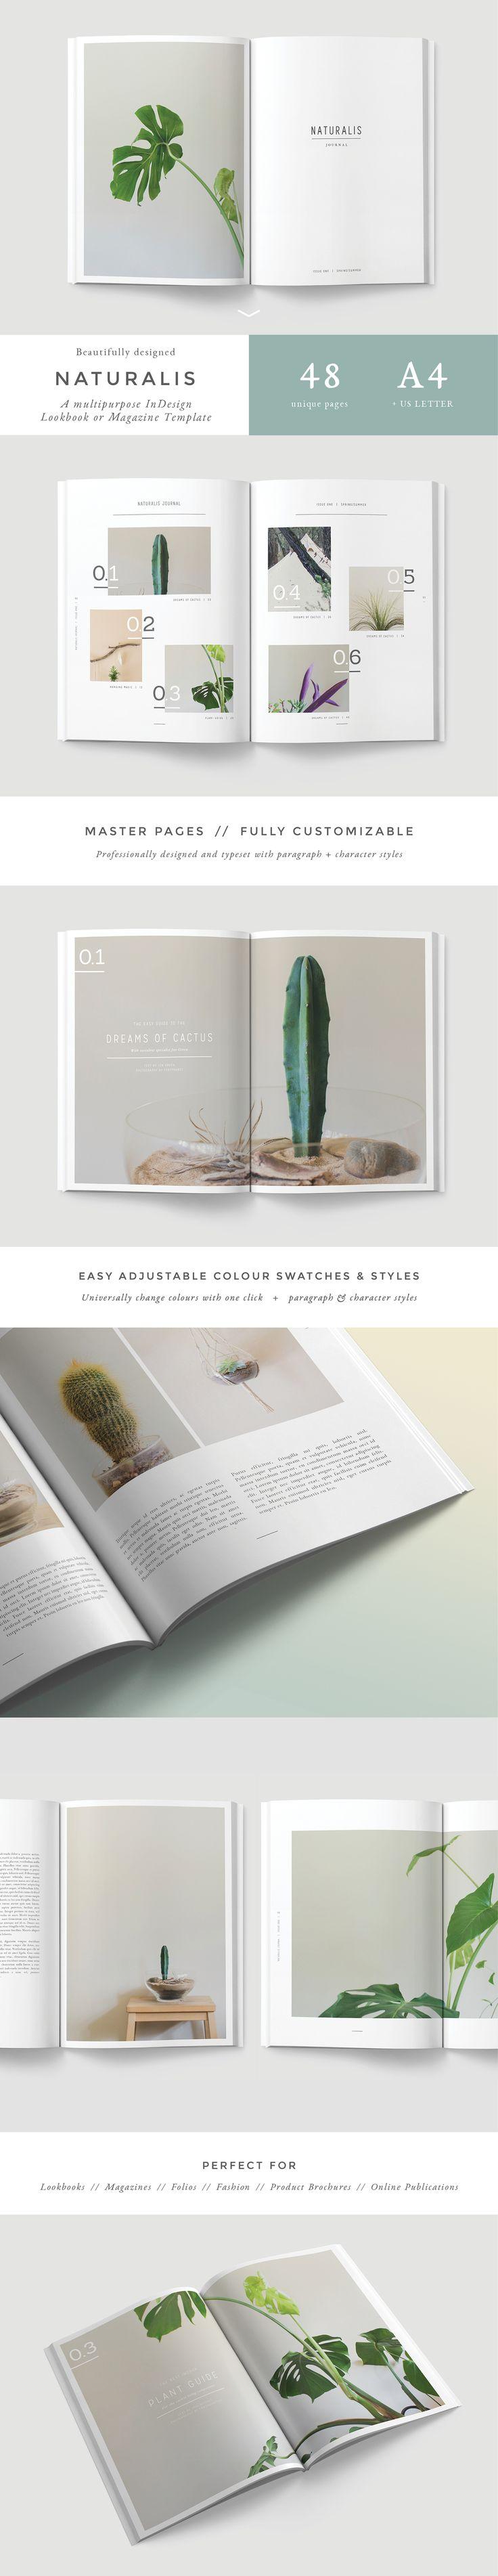 N A T U R A L I S Lookbook / Magazine on Behance